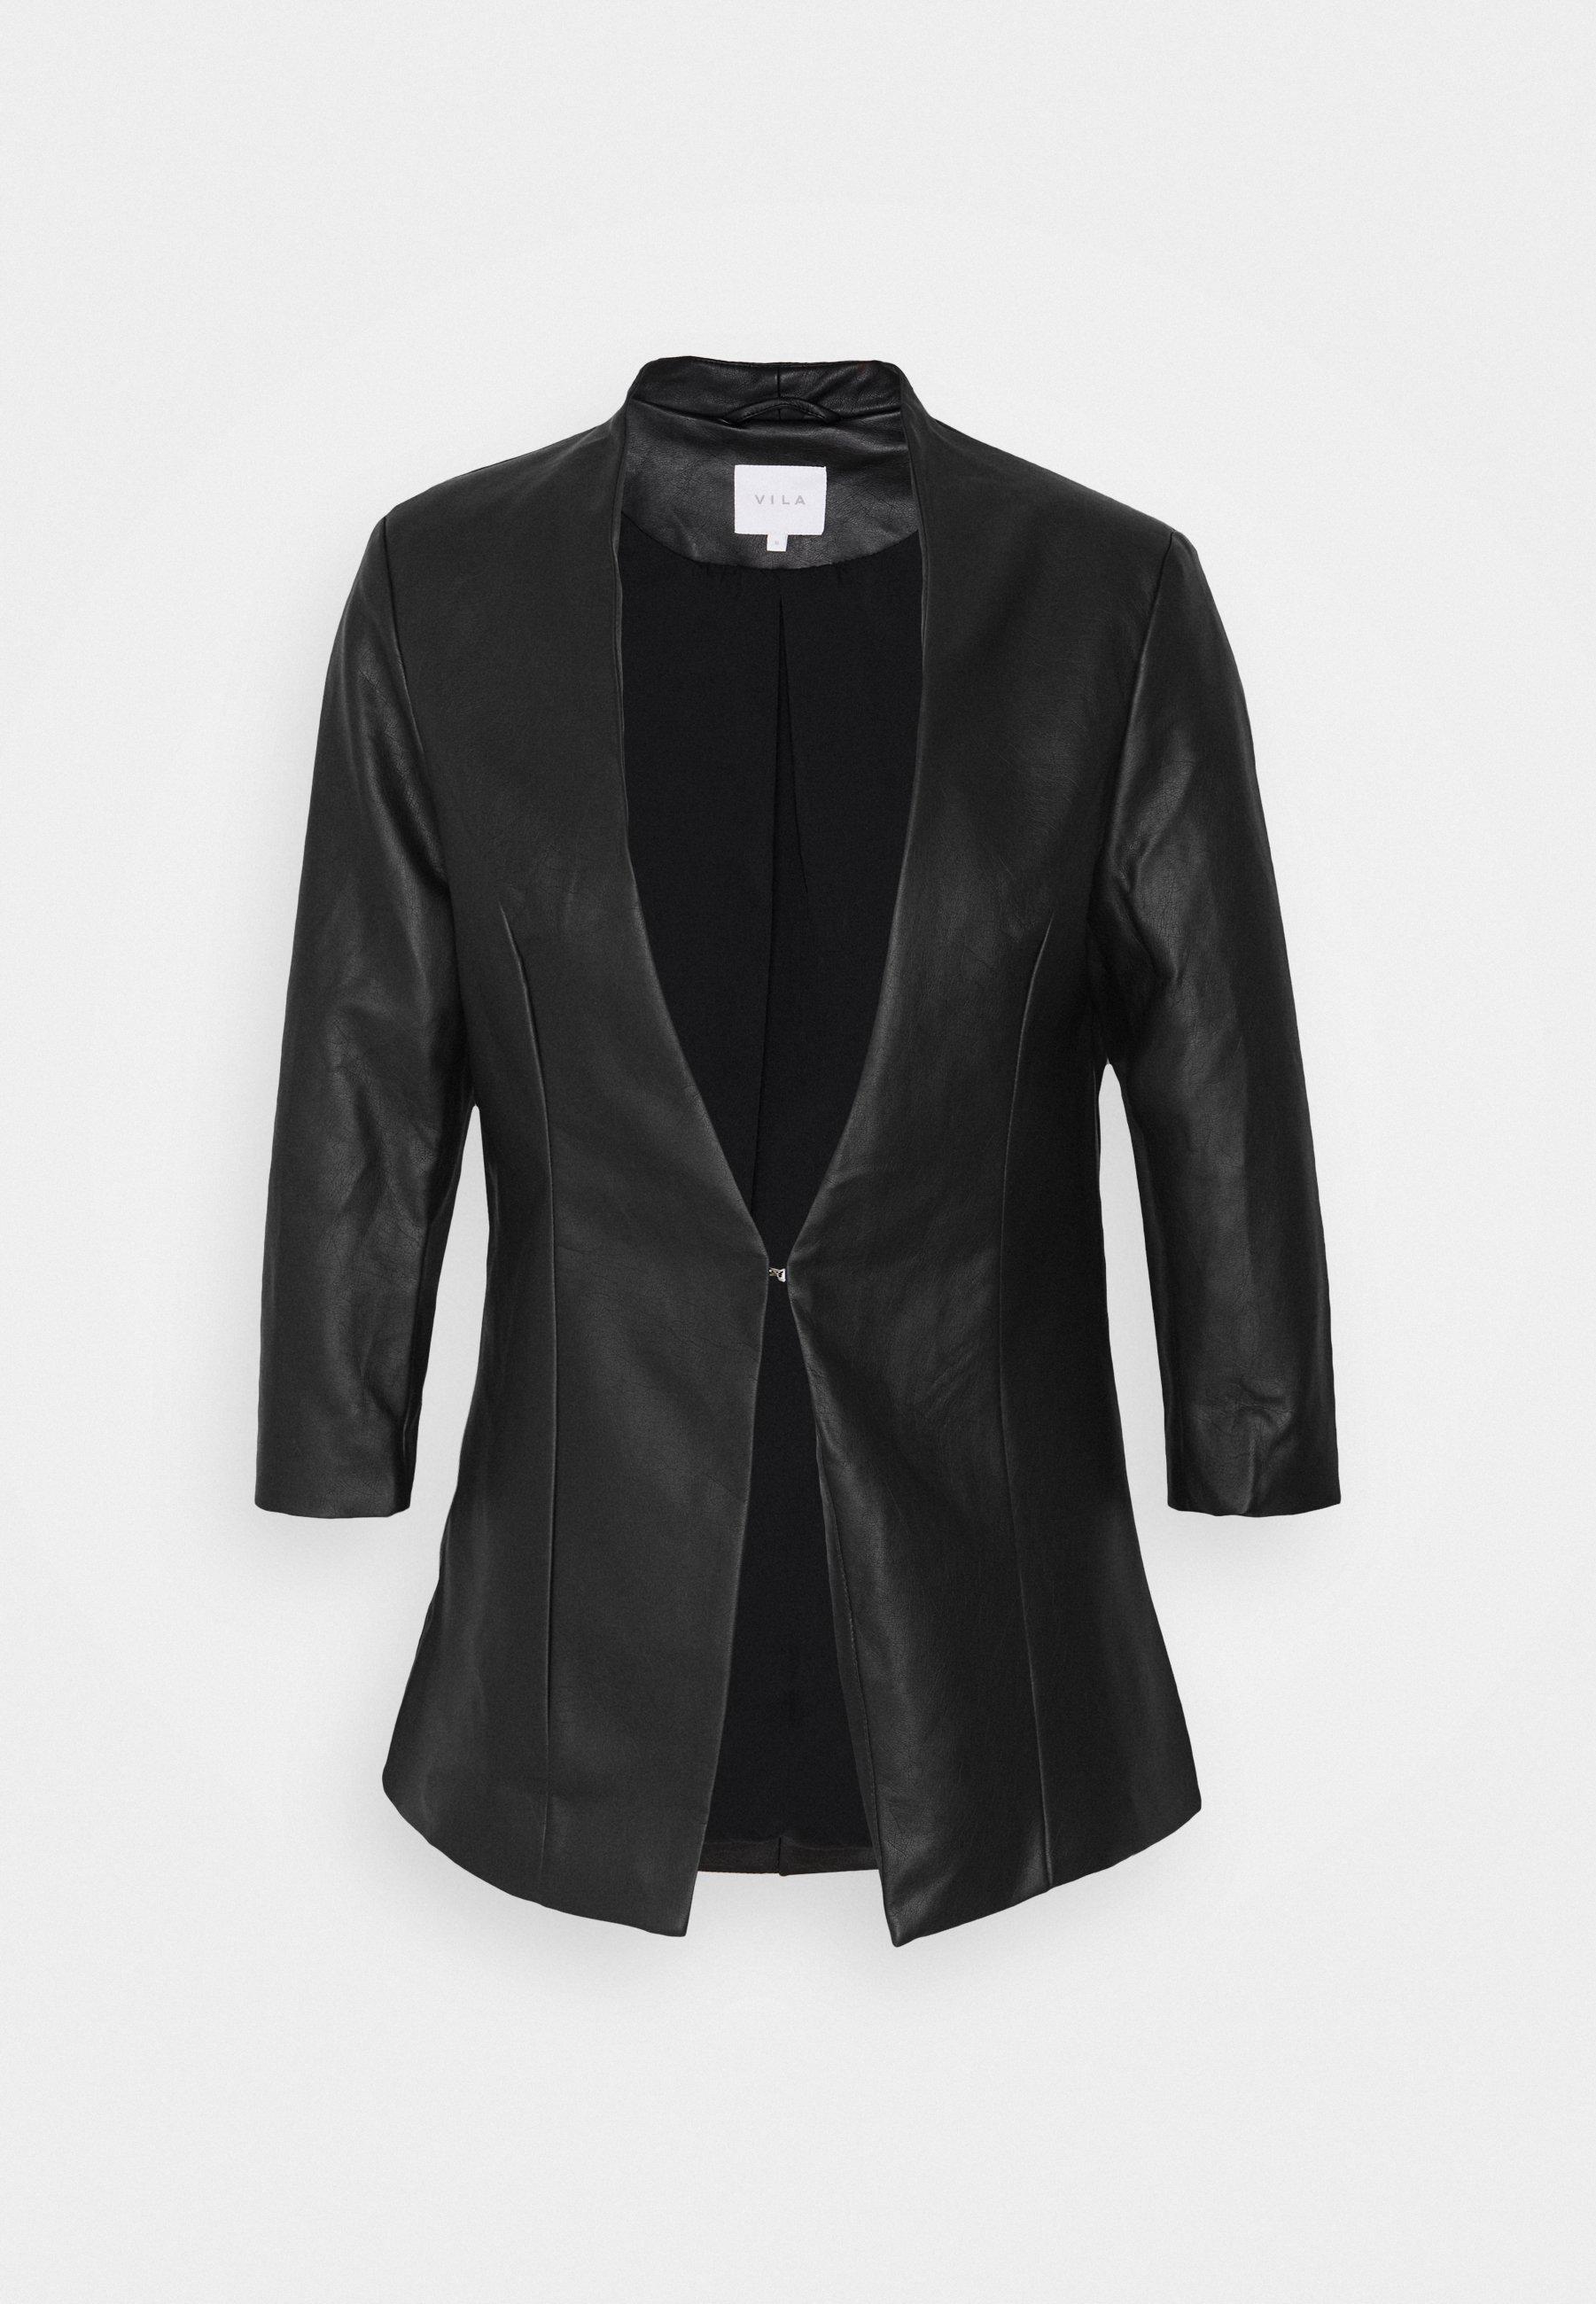 VILUPPI COATED Blazer black